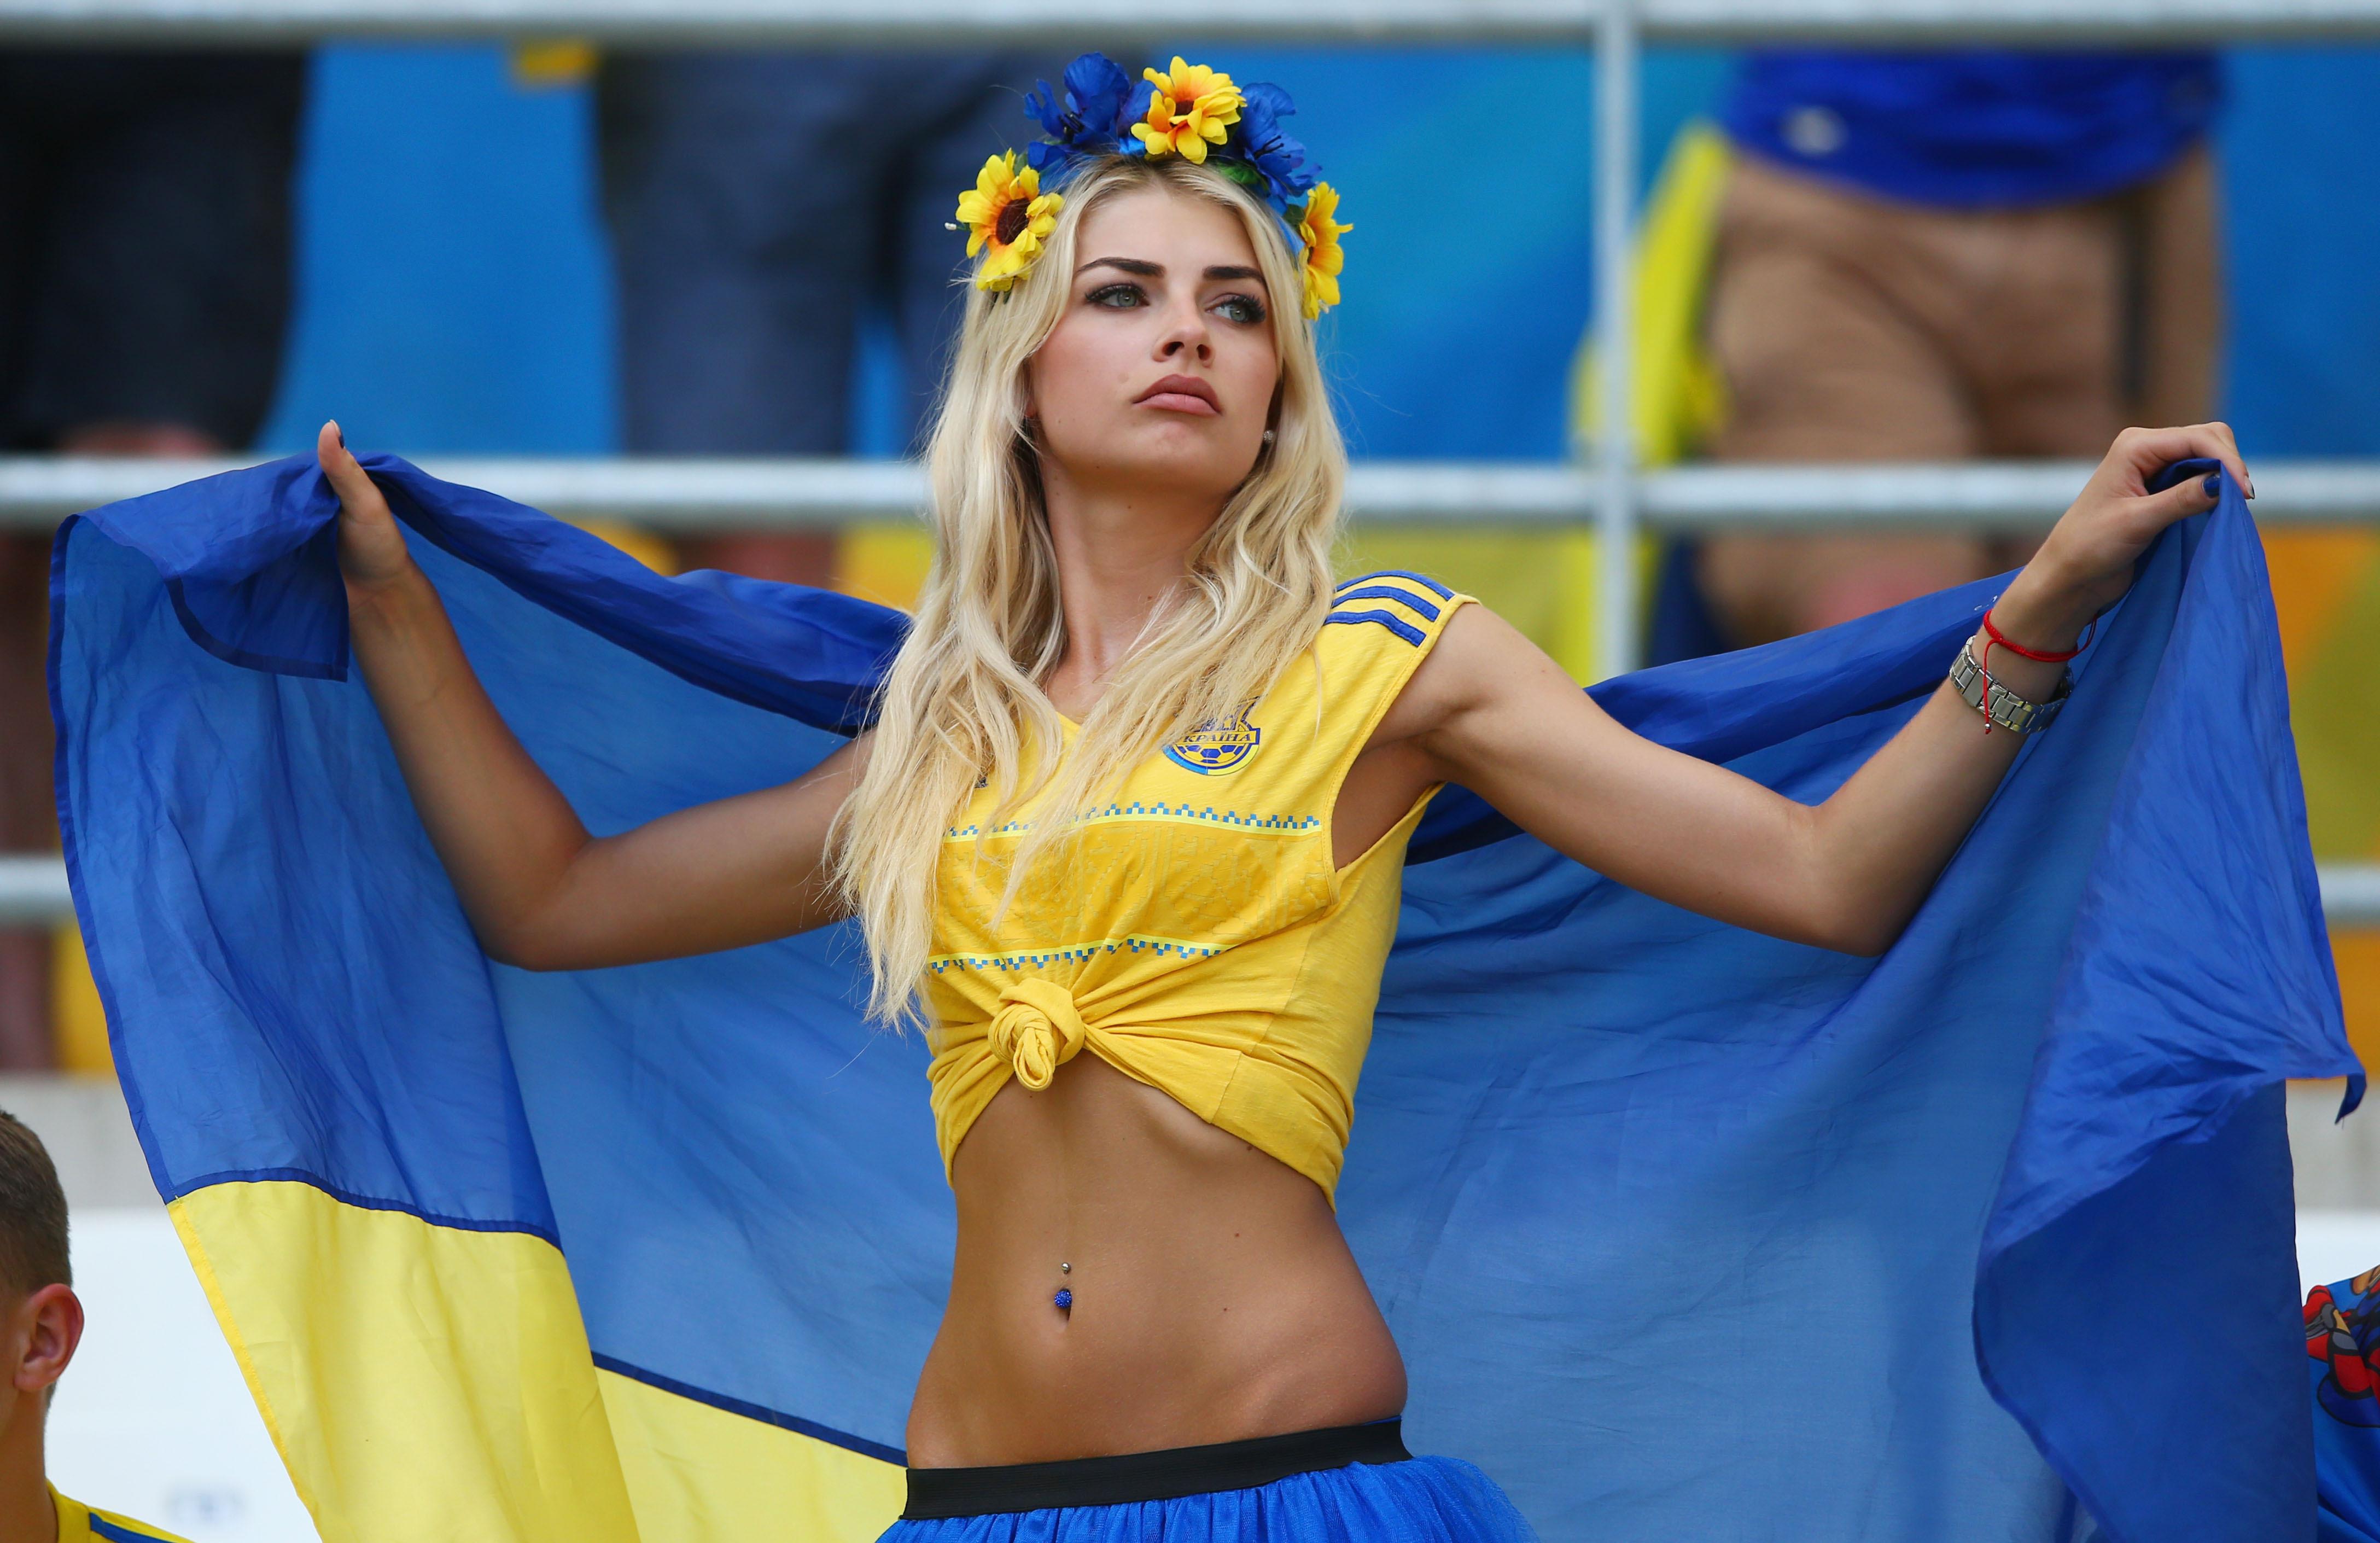 9-porno.ru Українські дівчата голі